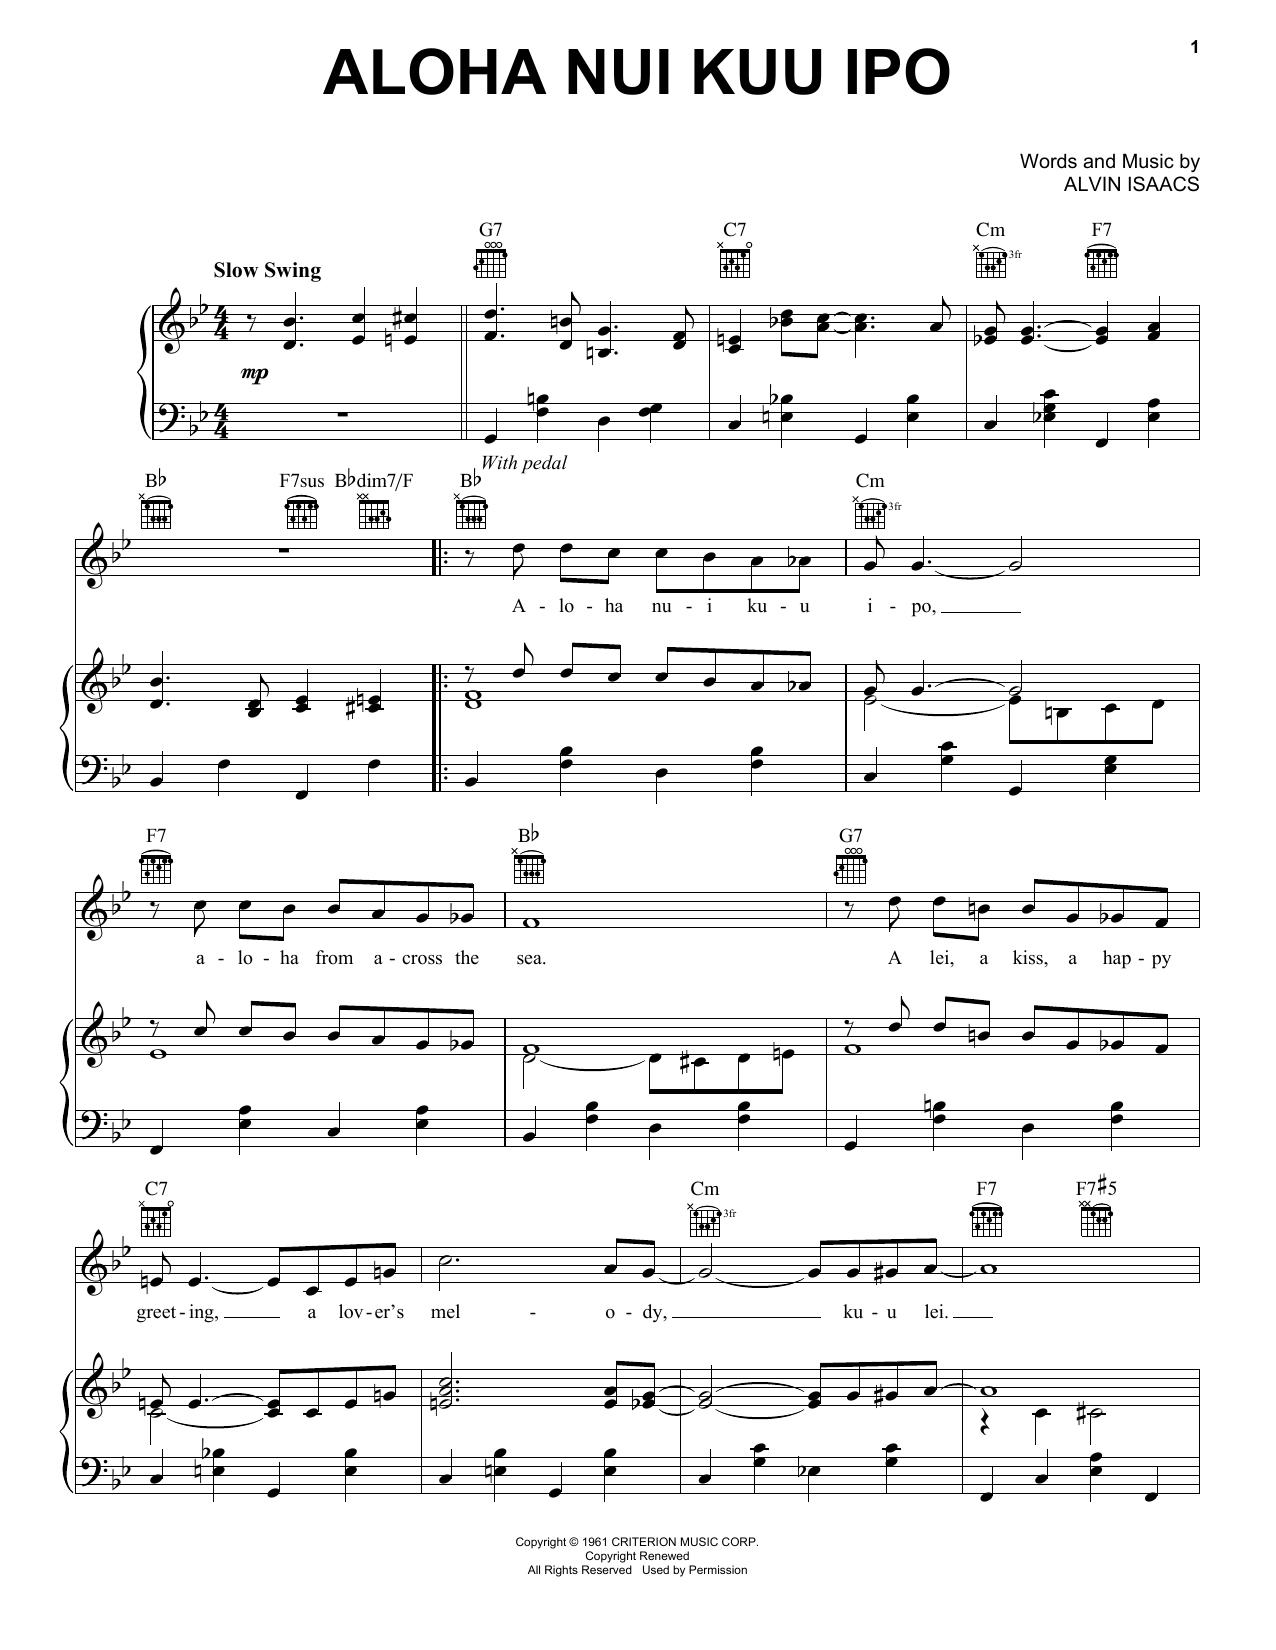 Aloha Nui Kuu Ipo (Piano, Vocal & Guitar (Right-Hand Melody))